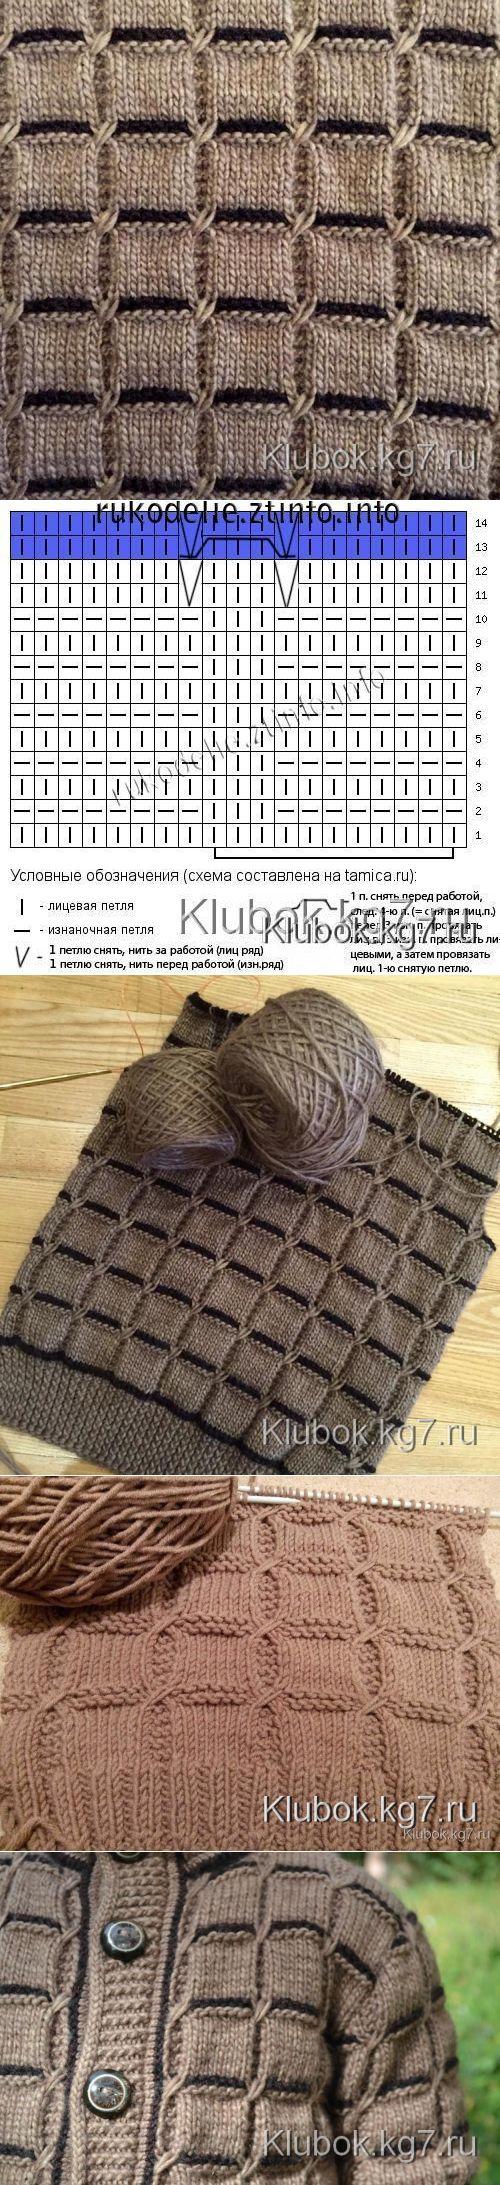 Pattern. Tatiana L. Master | Clew                                                                                                                                                                                 More